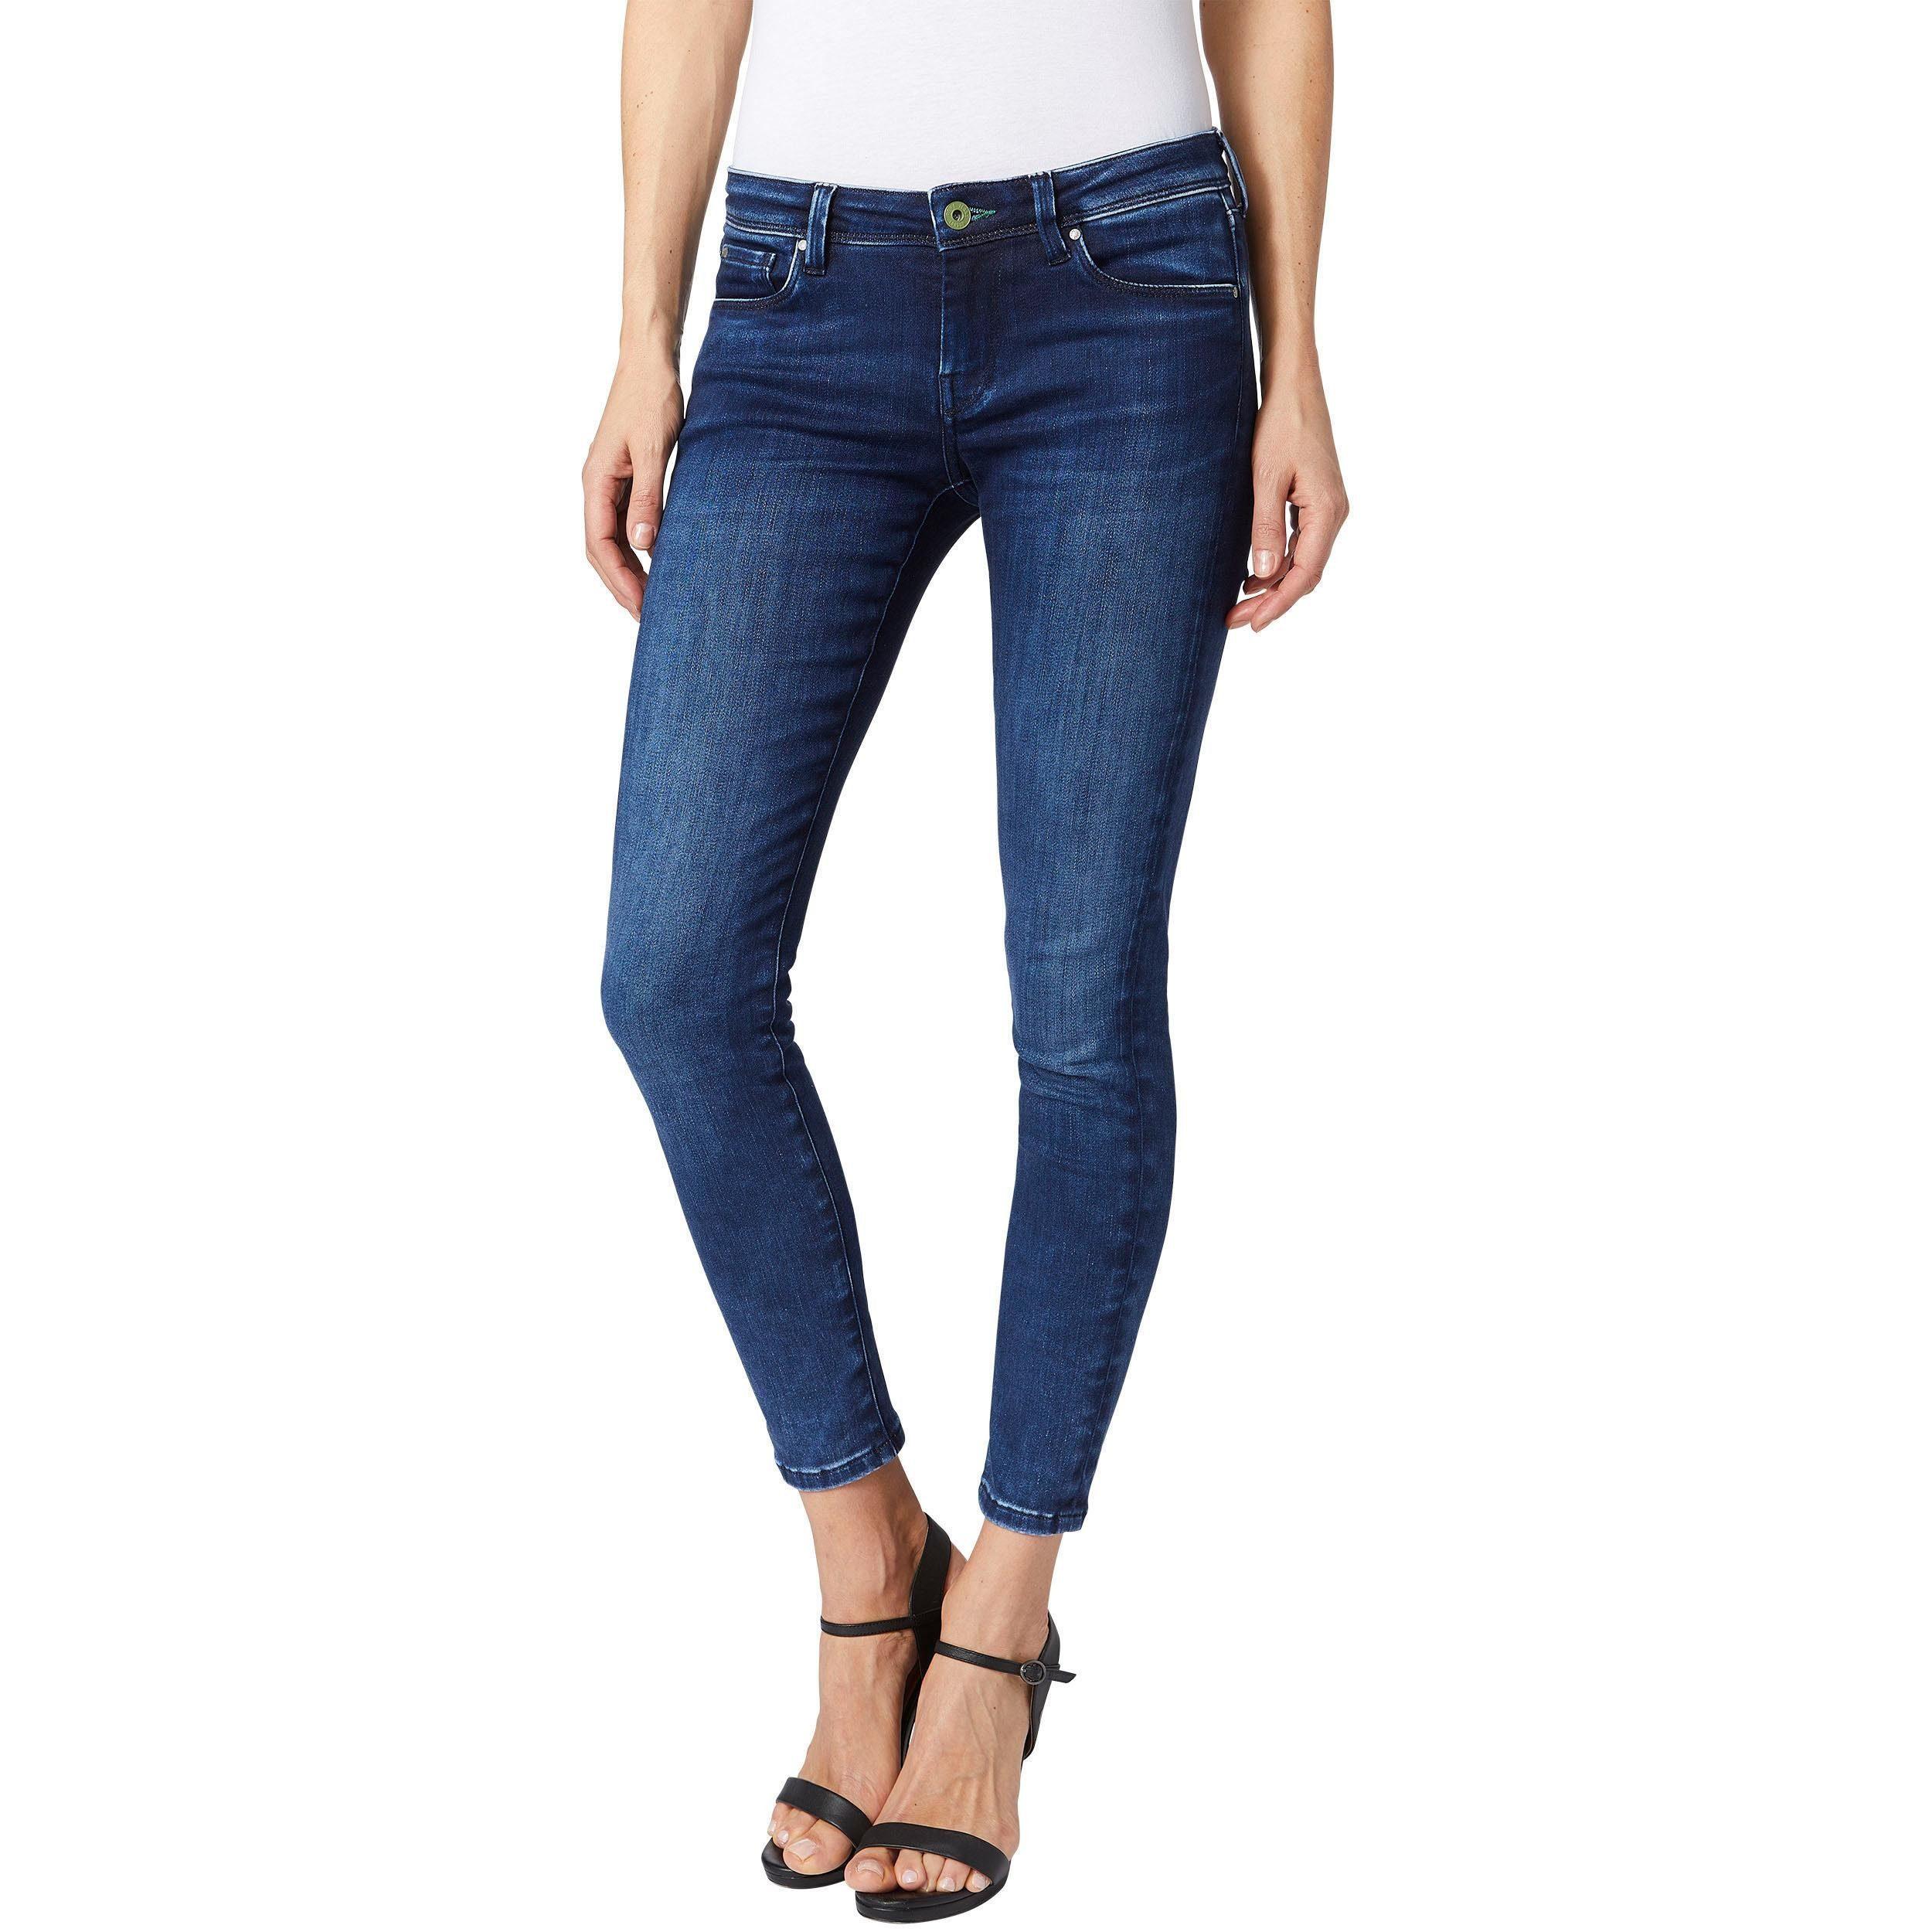 Pepe Jeans Skinny Fit Lola Vind Je Bij - Geweldige Prijs